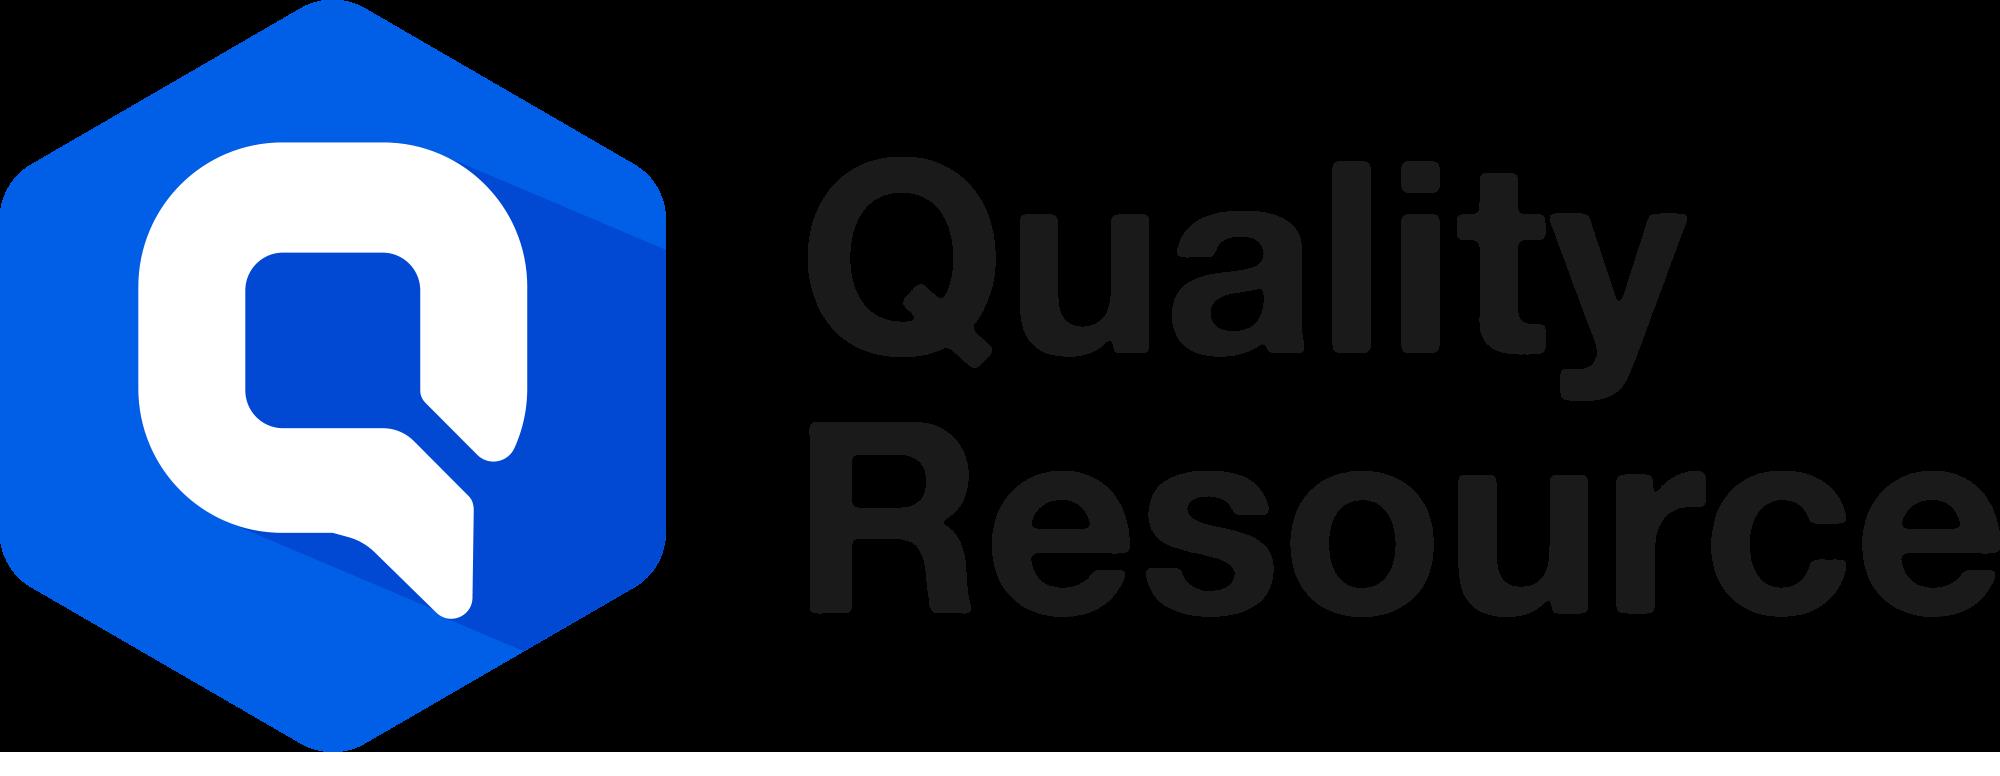 Quality Resource